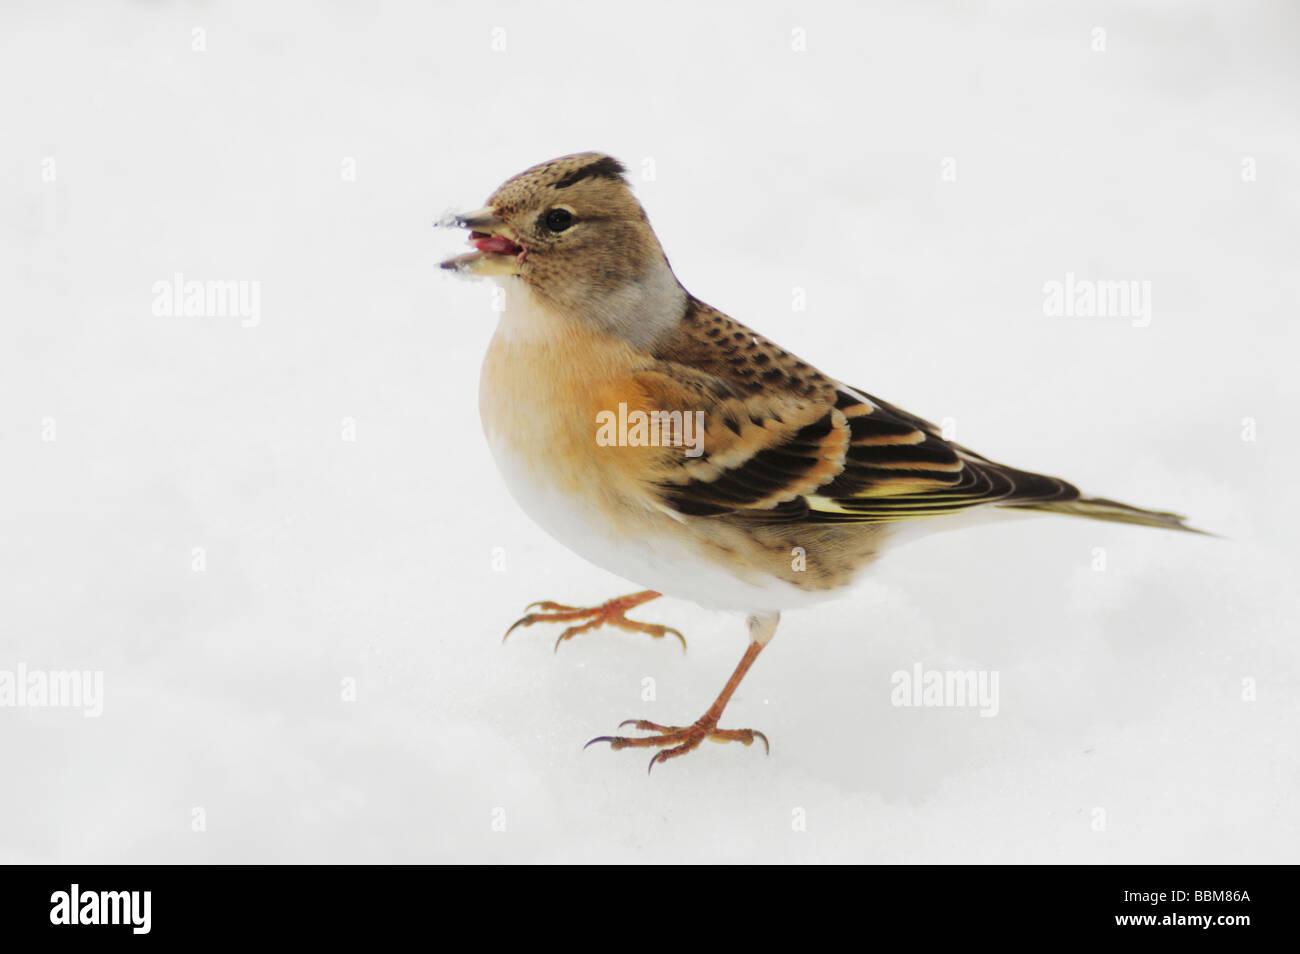 Brambling Fringilla montifringilla female eating seeds on snow Zug Switzerland December 2007 - Stock Image